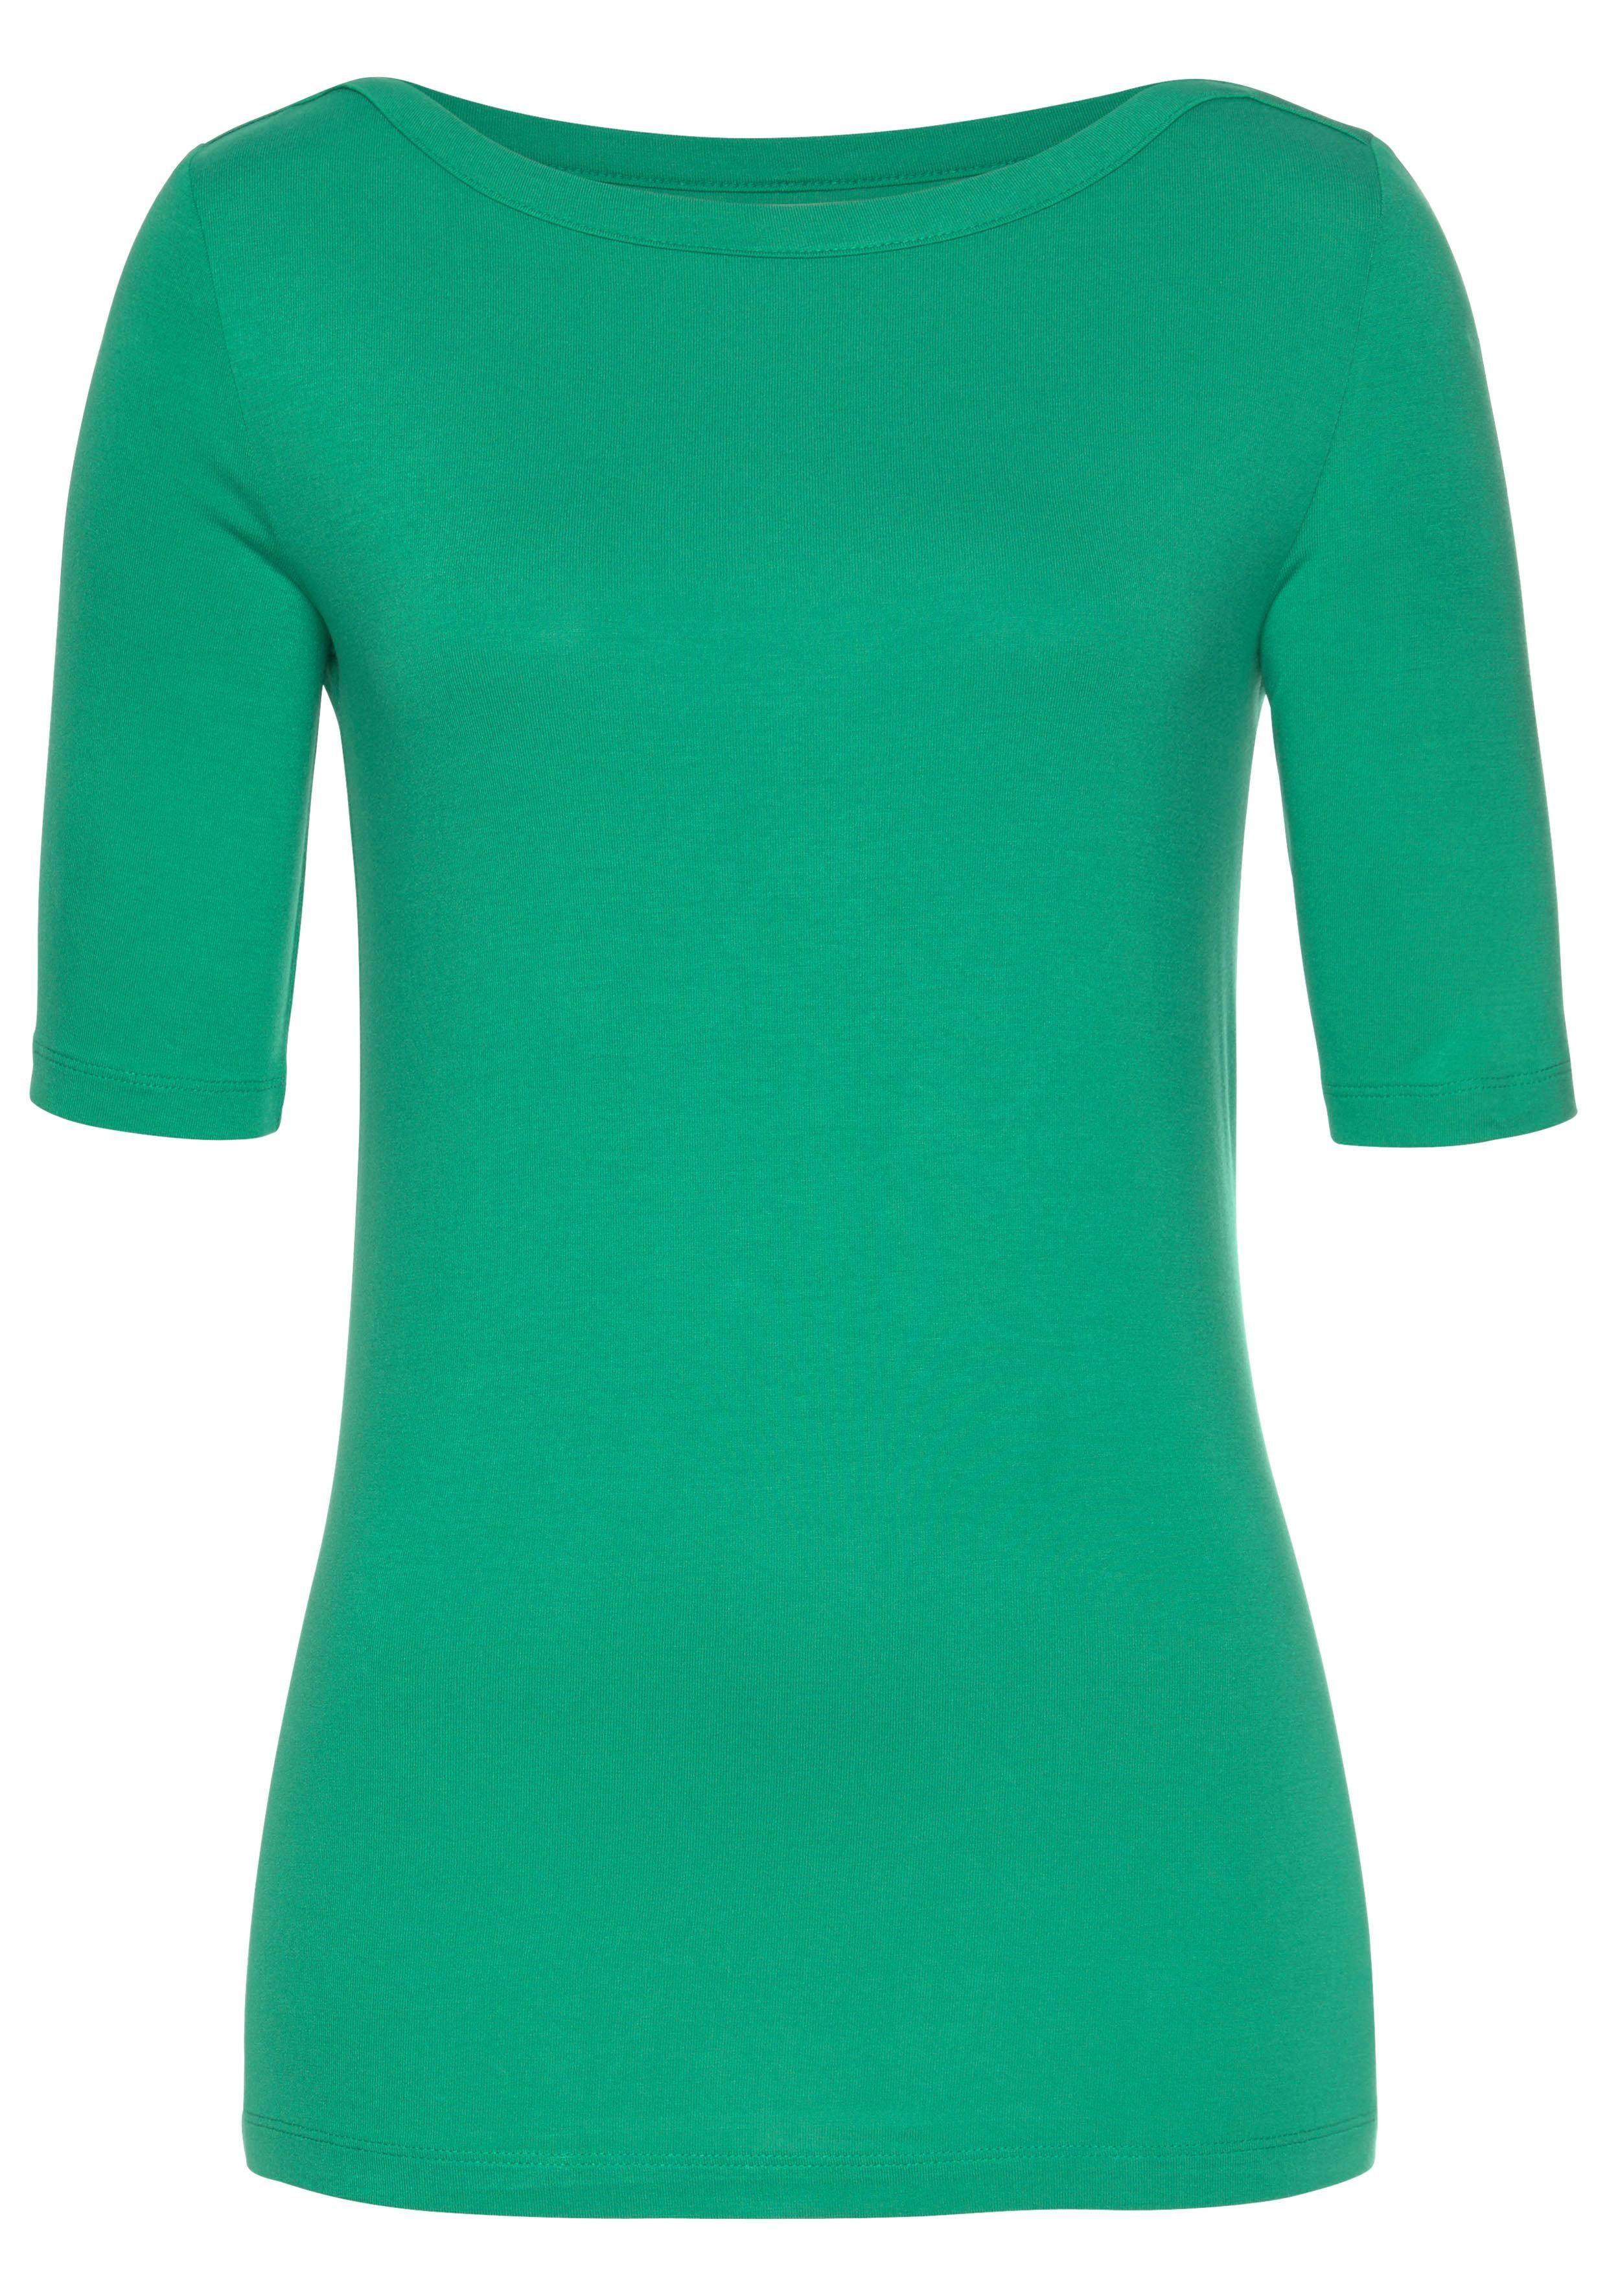 3 Tailor shirt T Arm Tom Mit 4 wfqvUw46